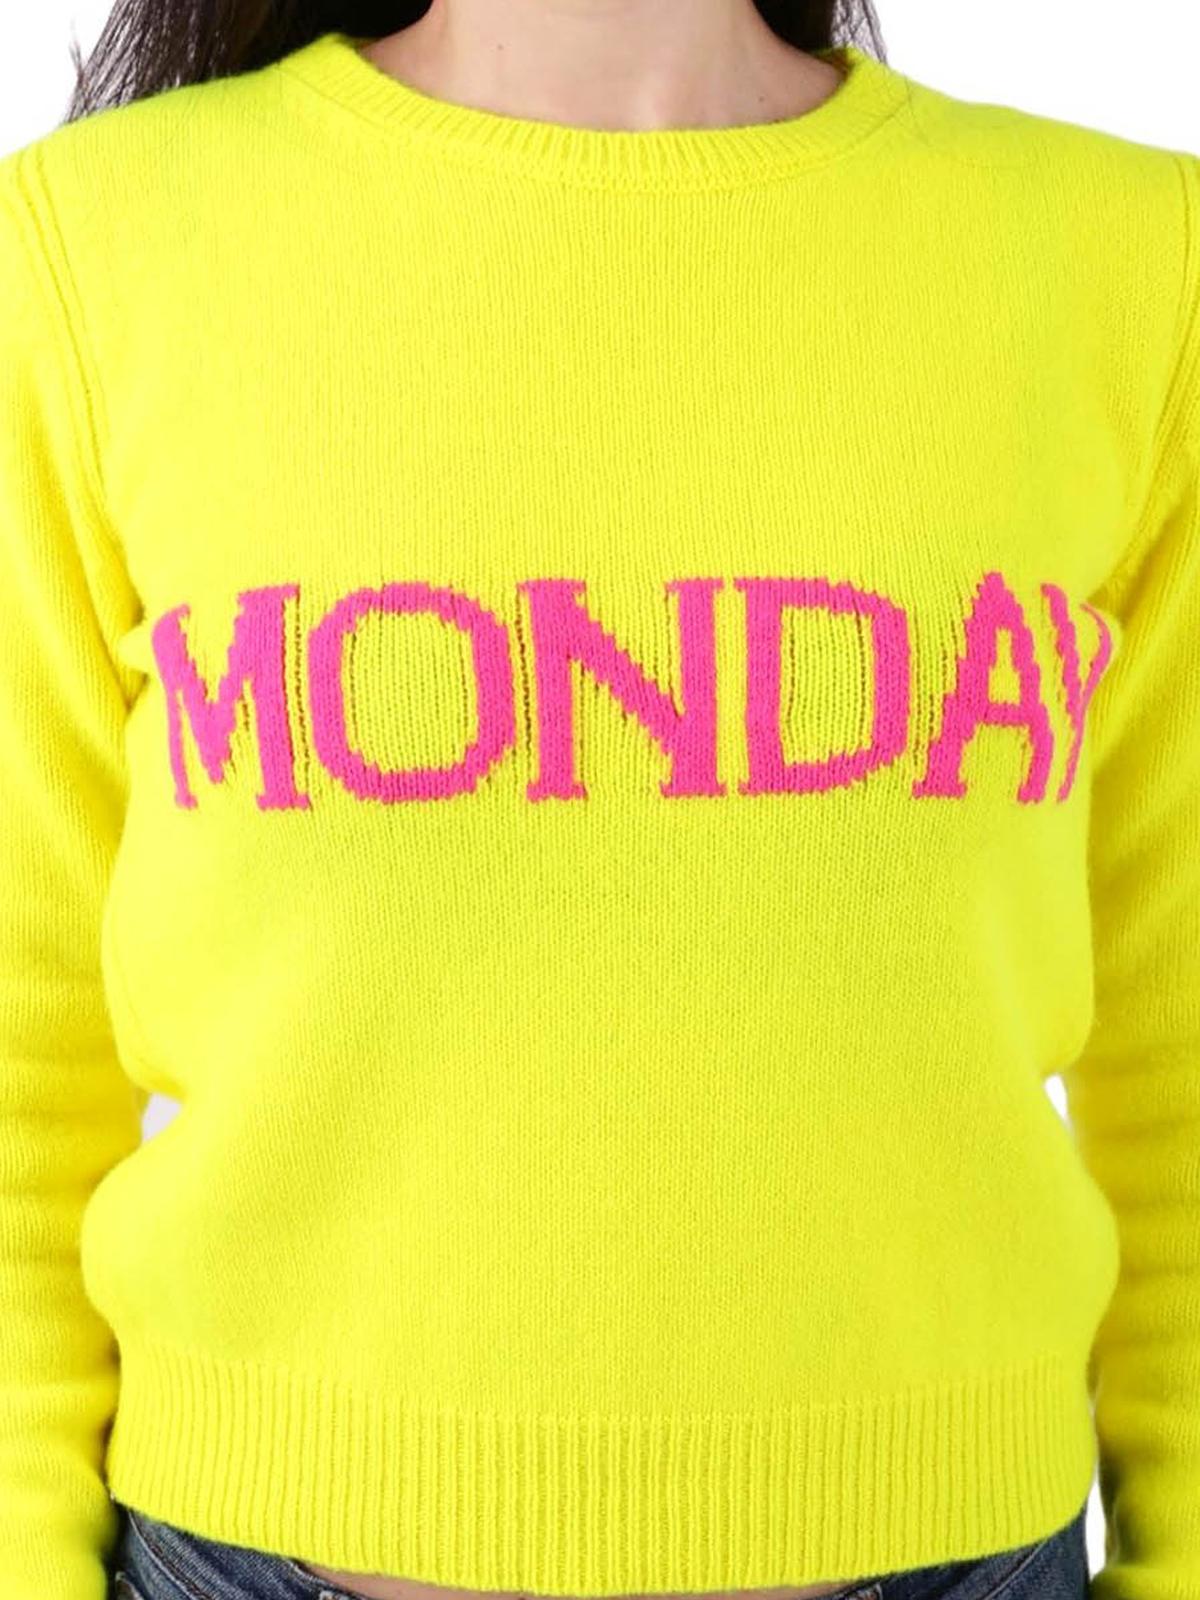 Alberta Ferretti Rainbow Week Monday Sweater Crew Necks